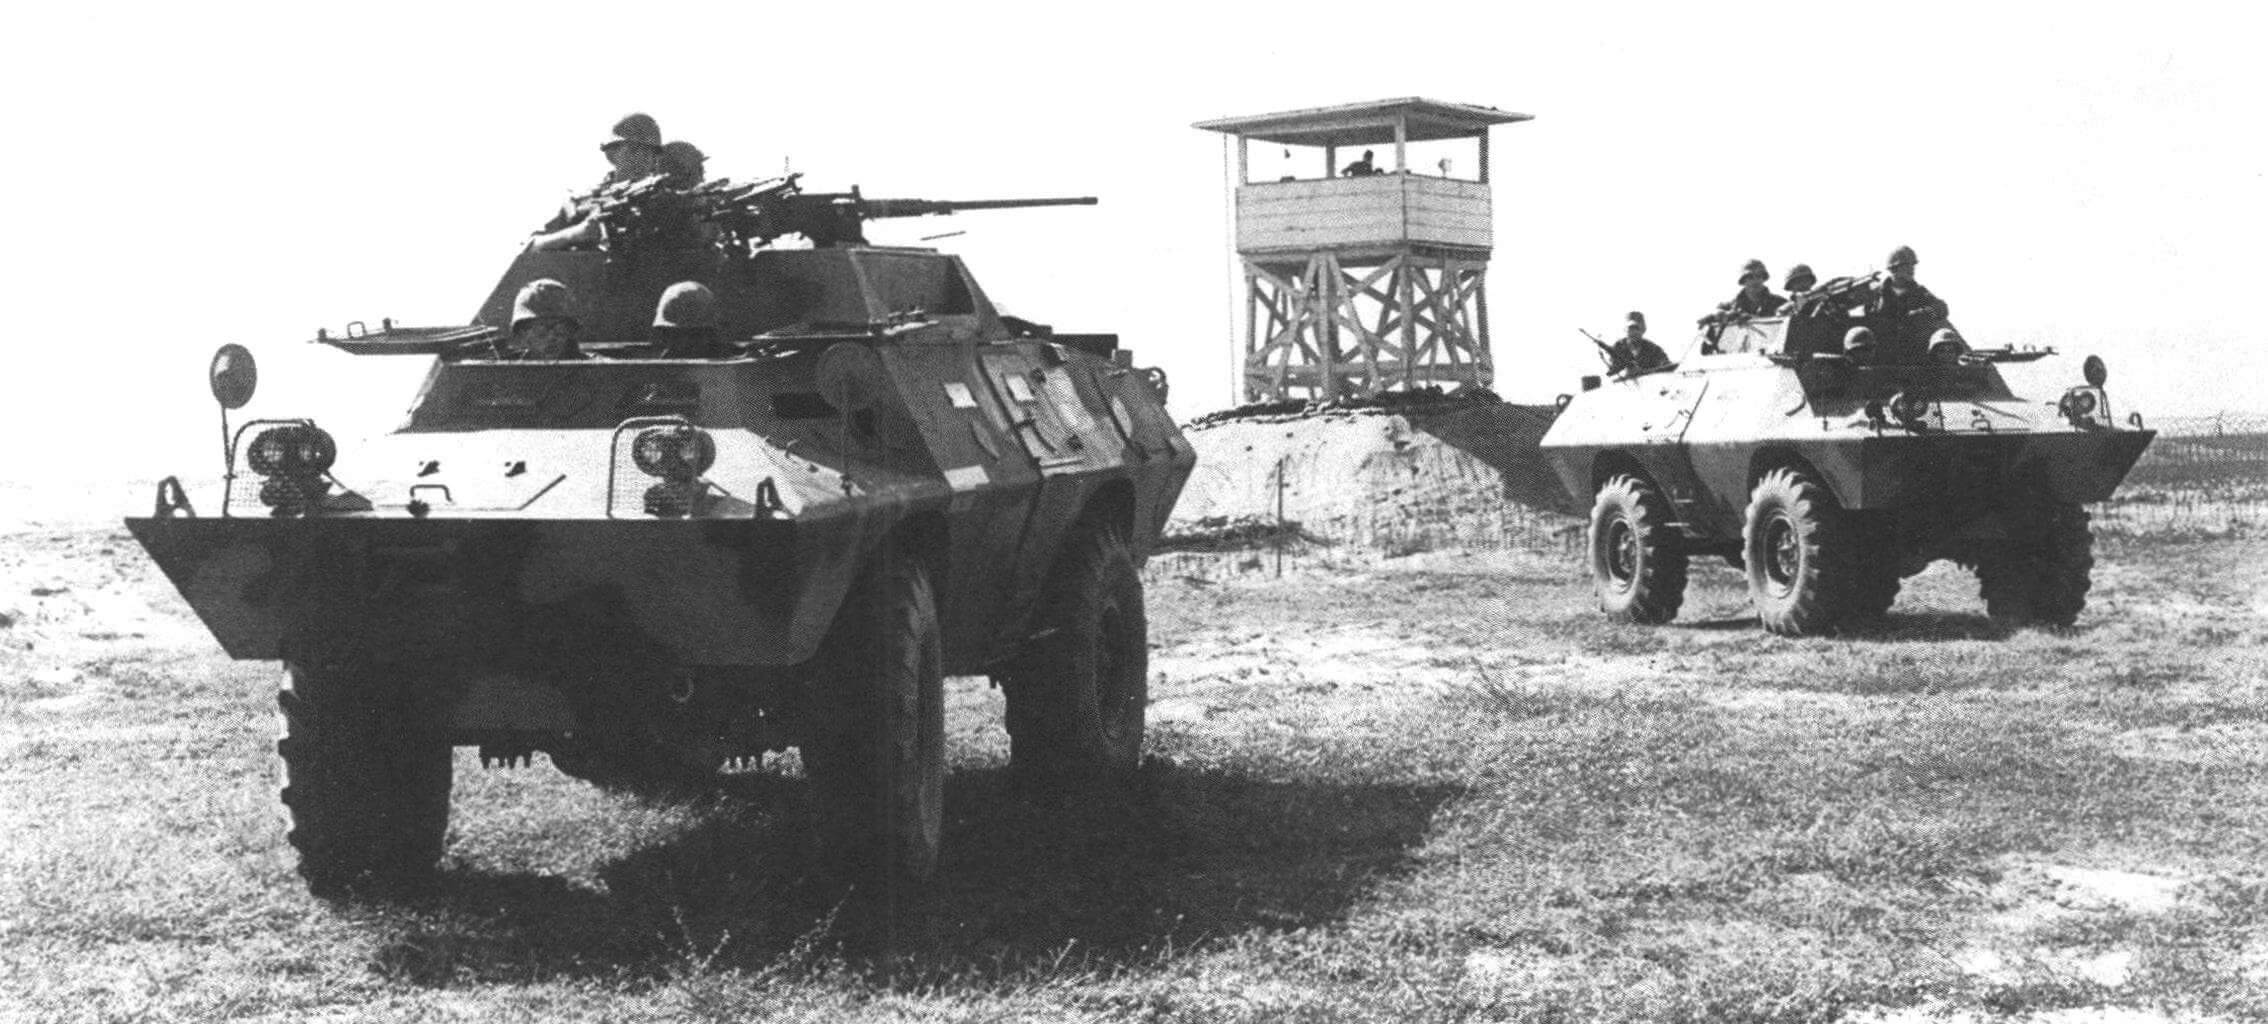 «Коммандо» V-100, Вьетнам, 1968 год